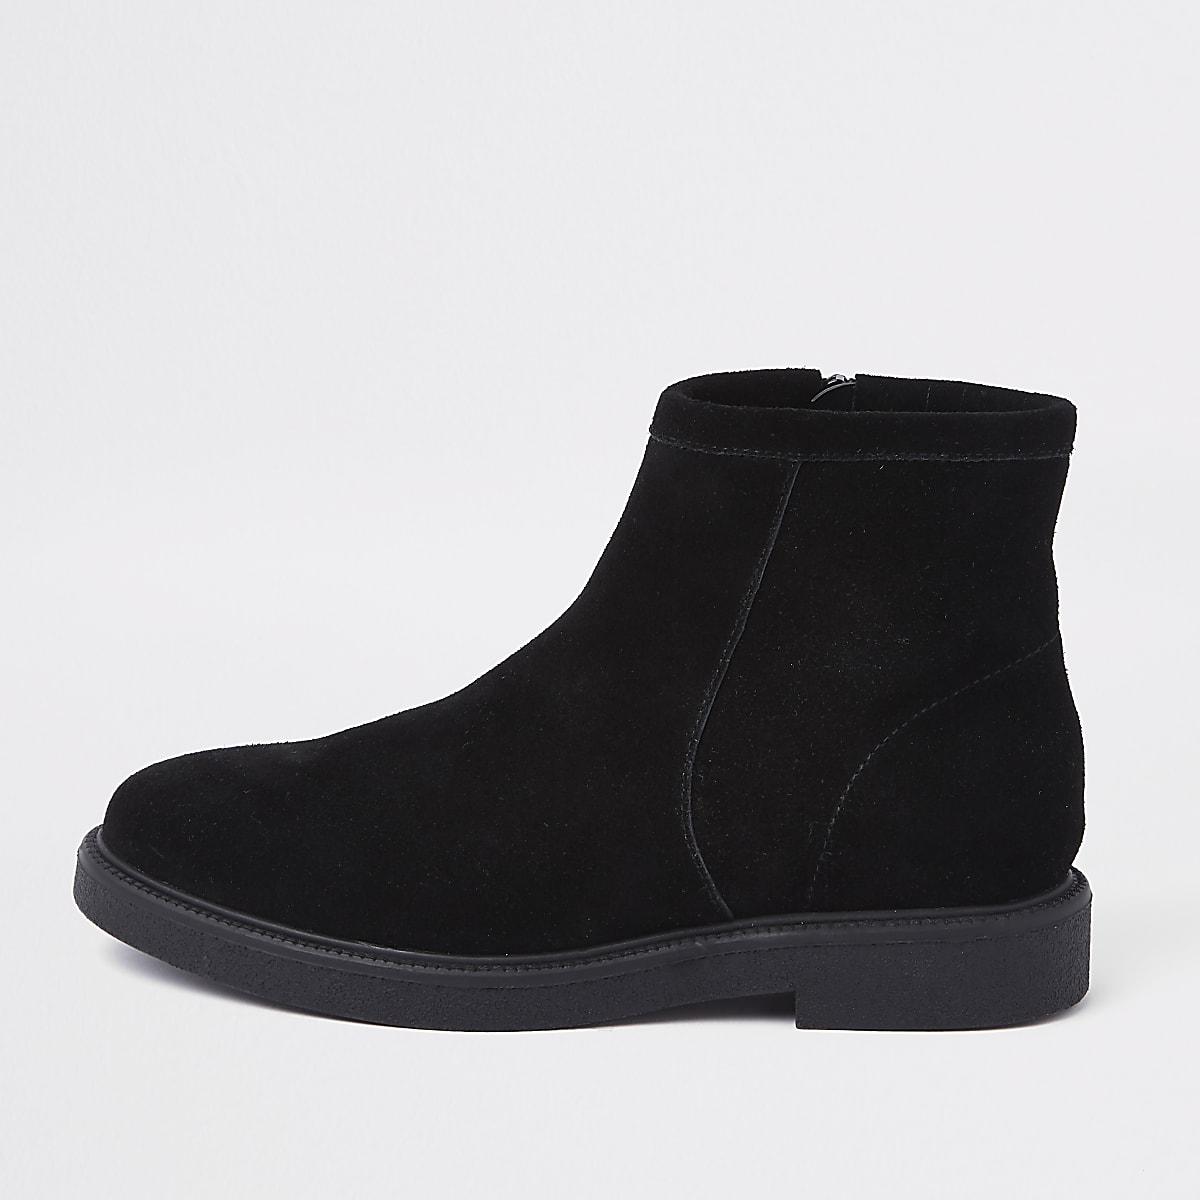 4286c9b7531 Black low heel ankle boots